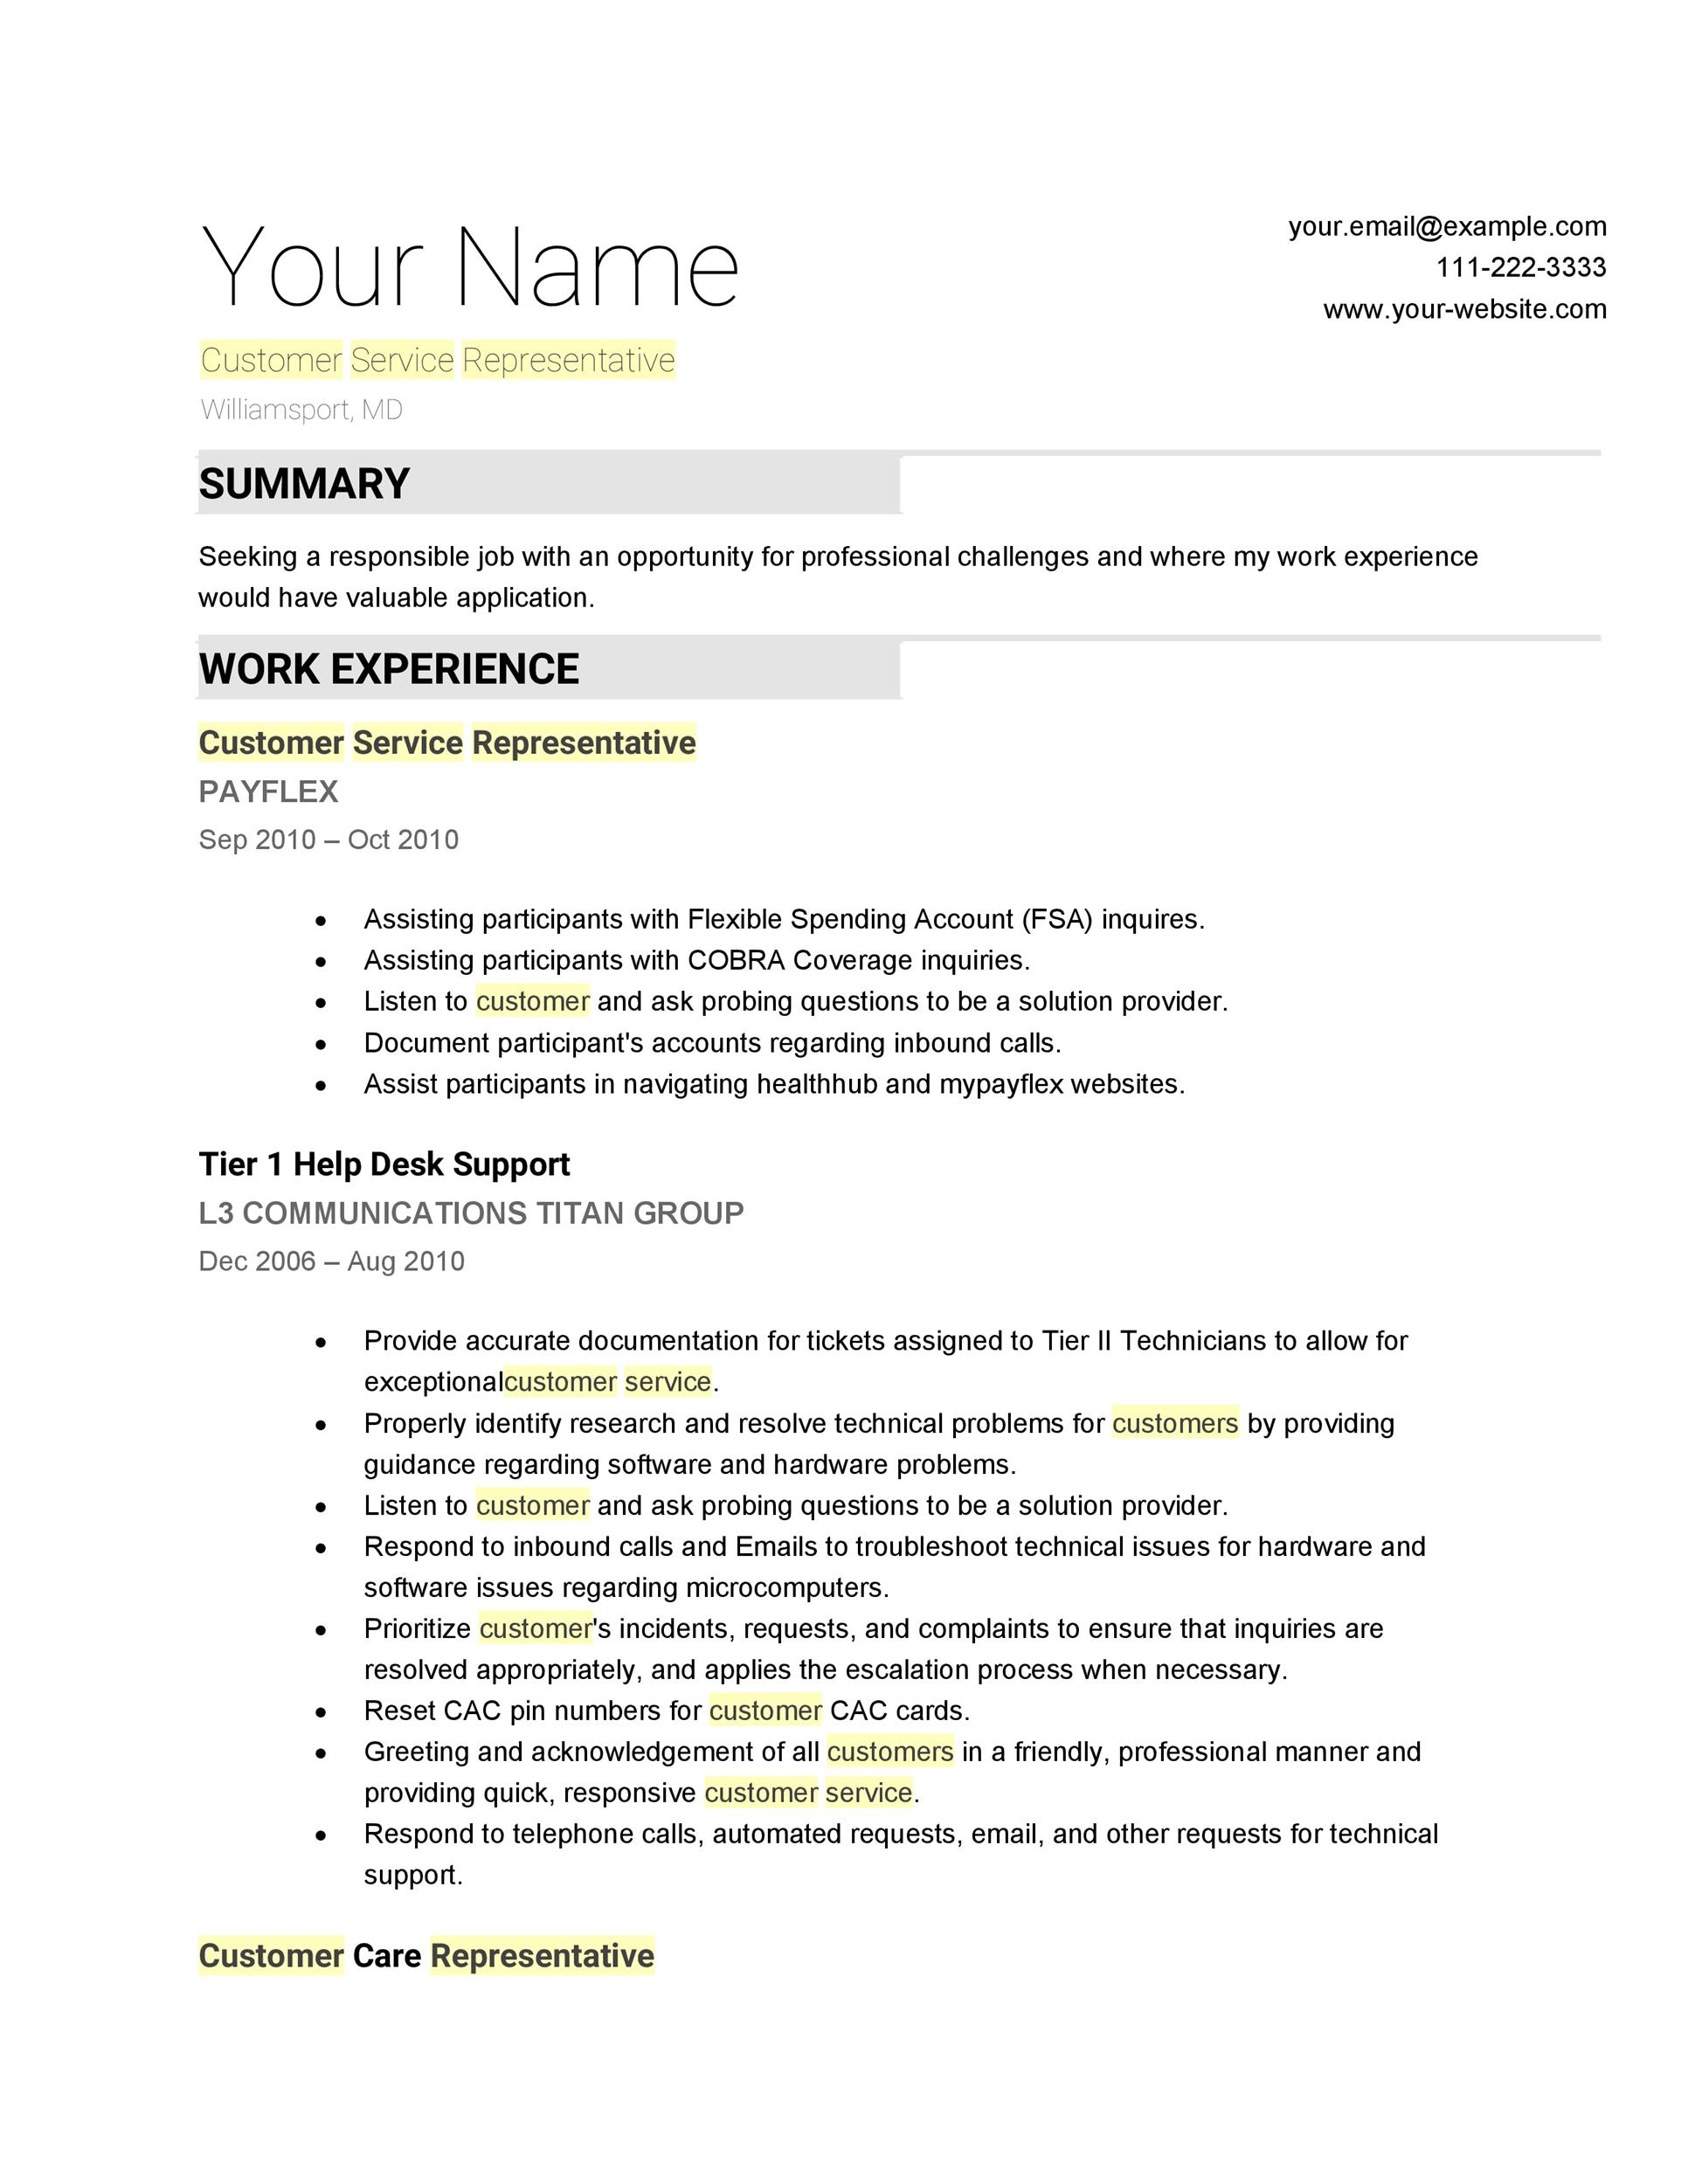 resume template servics